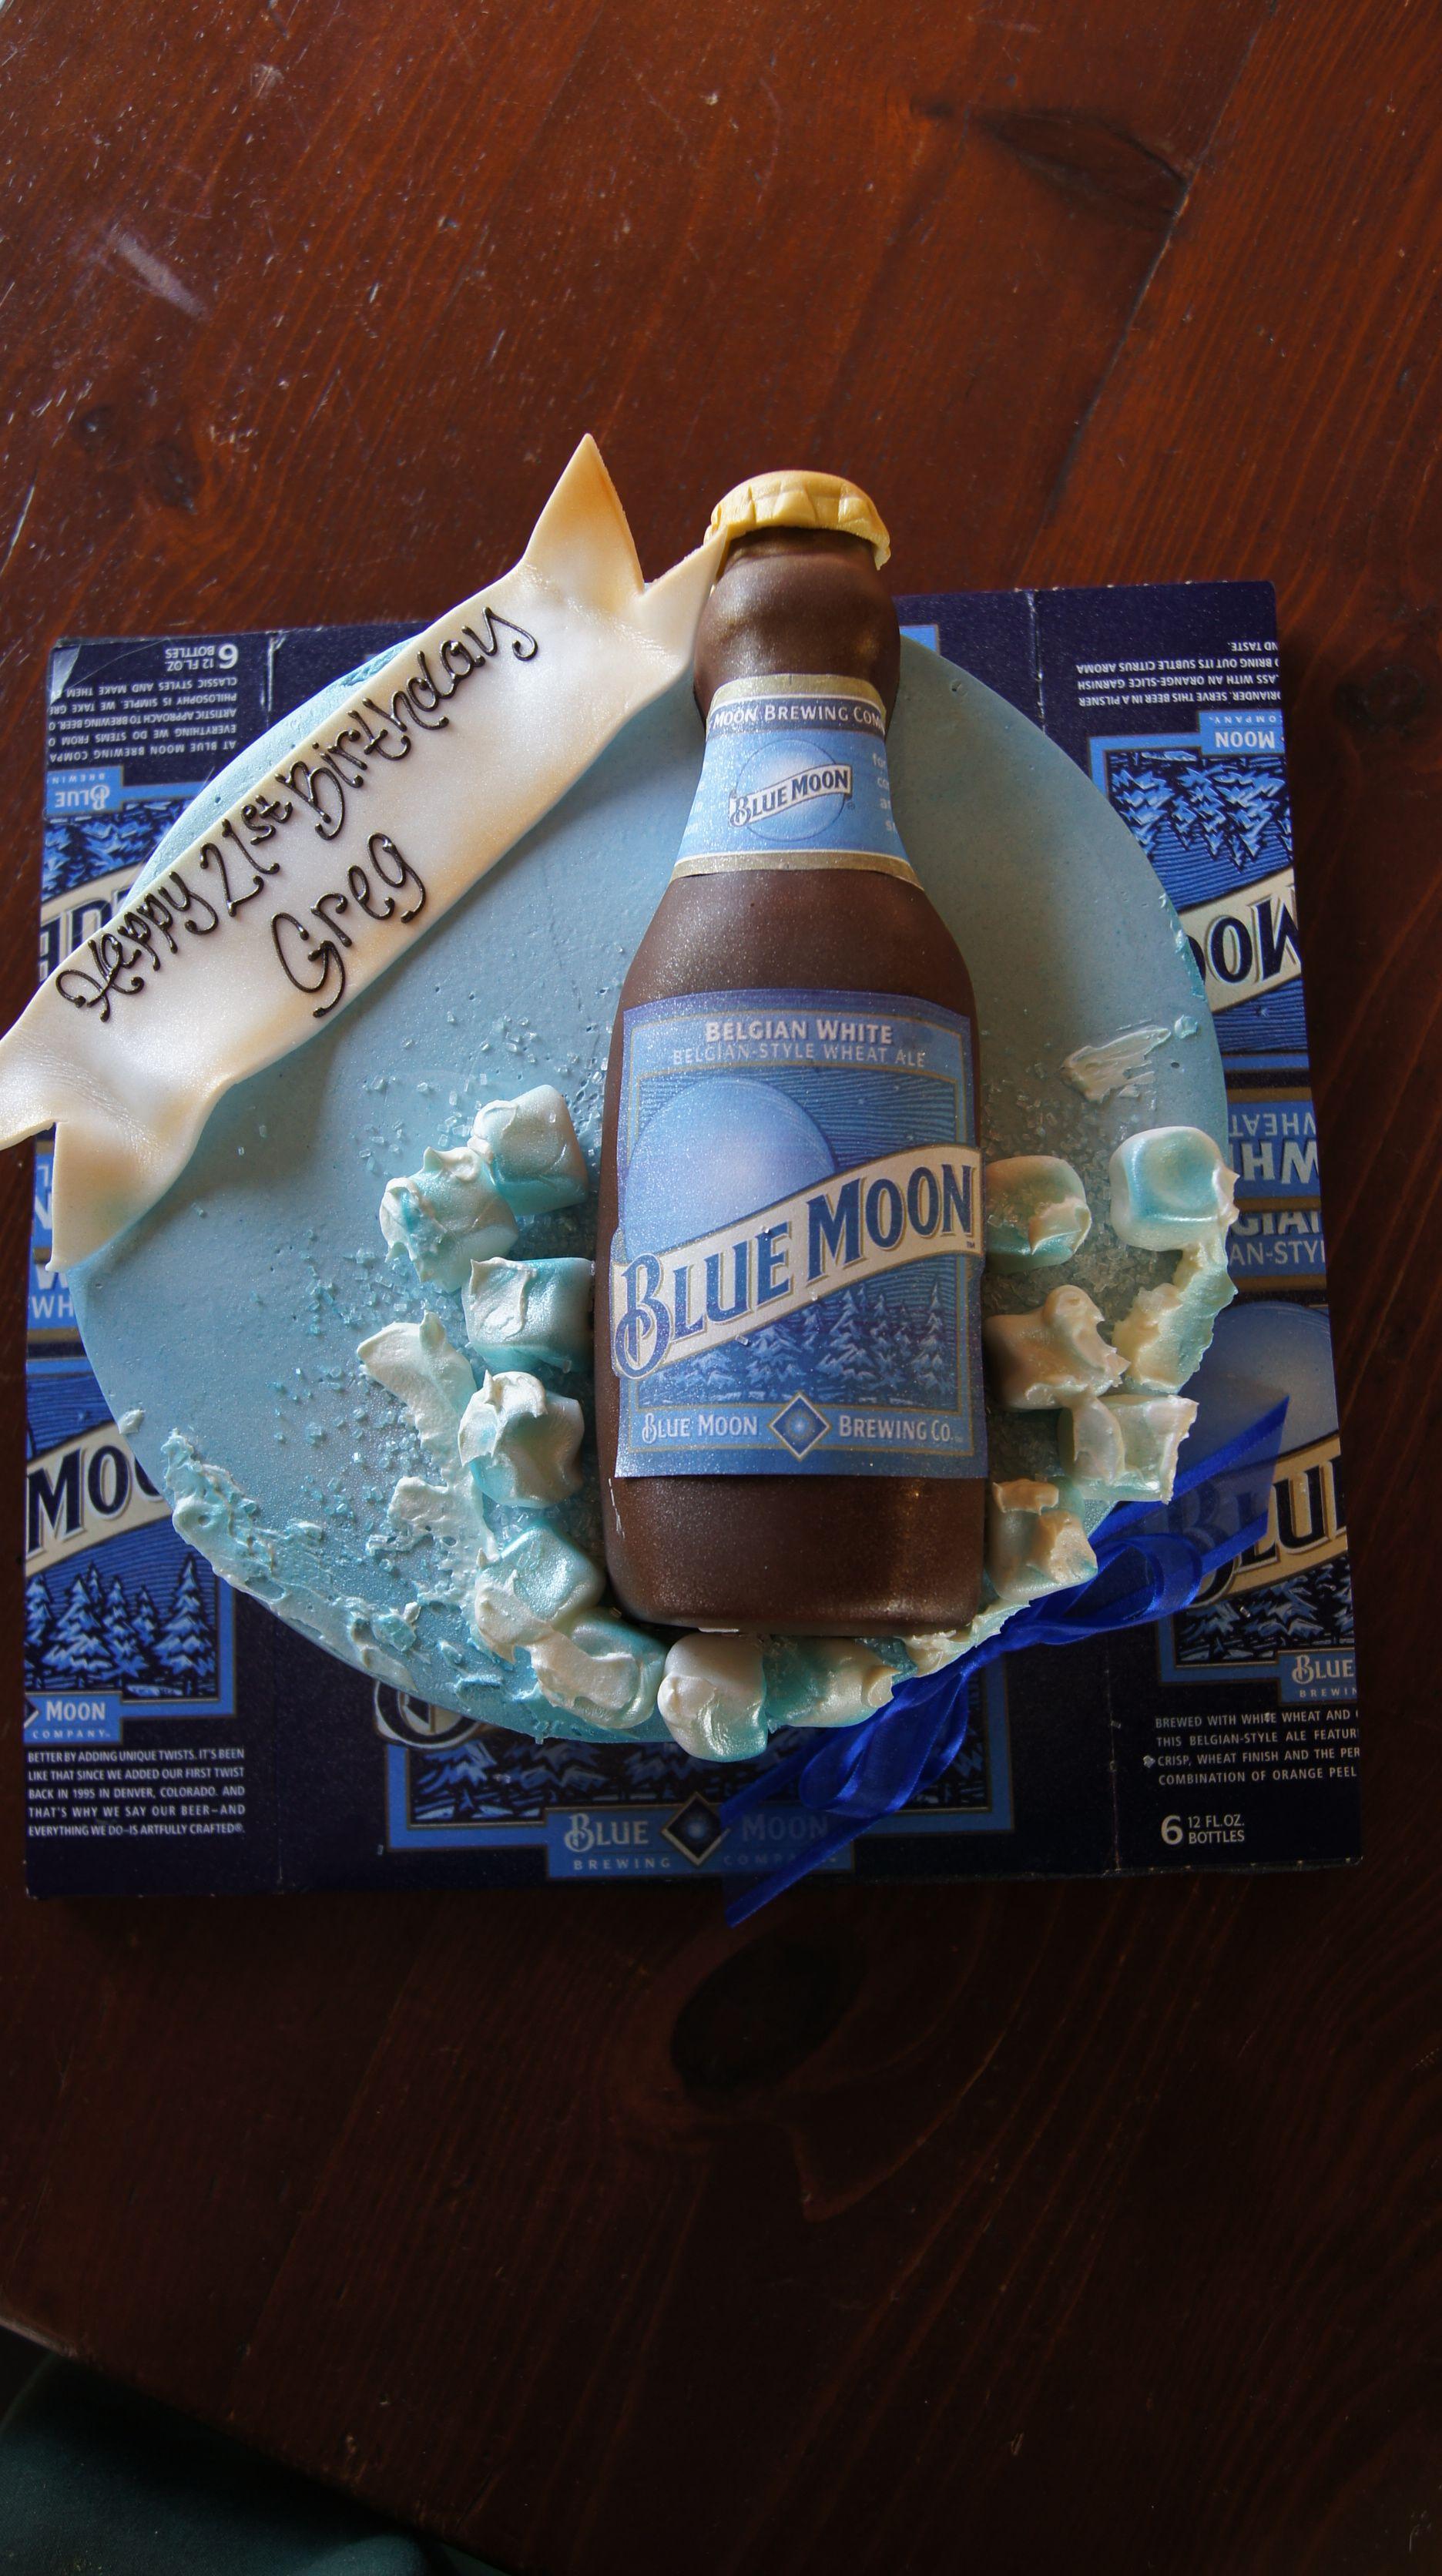 set of 4 Guy Mug Glasses cut from Blue Moon Beer Bottles